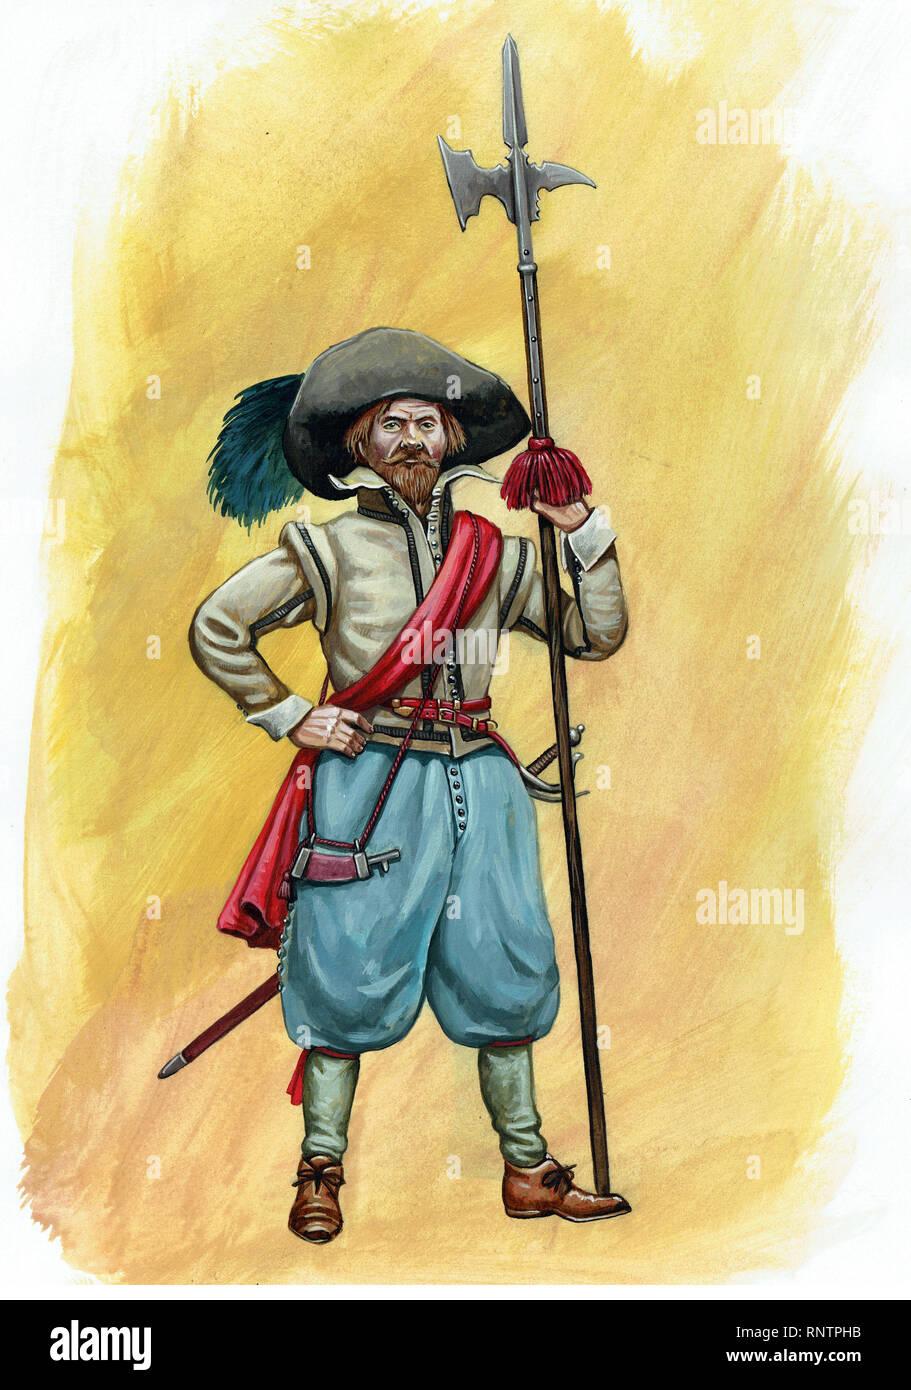 Dutch halberd bearer illustration. Medieval soldier with halberd picture. - Stock Image